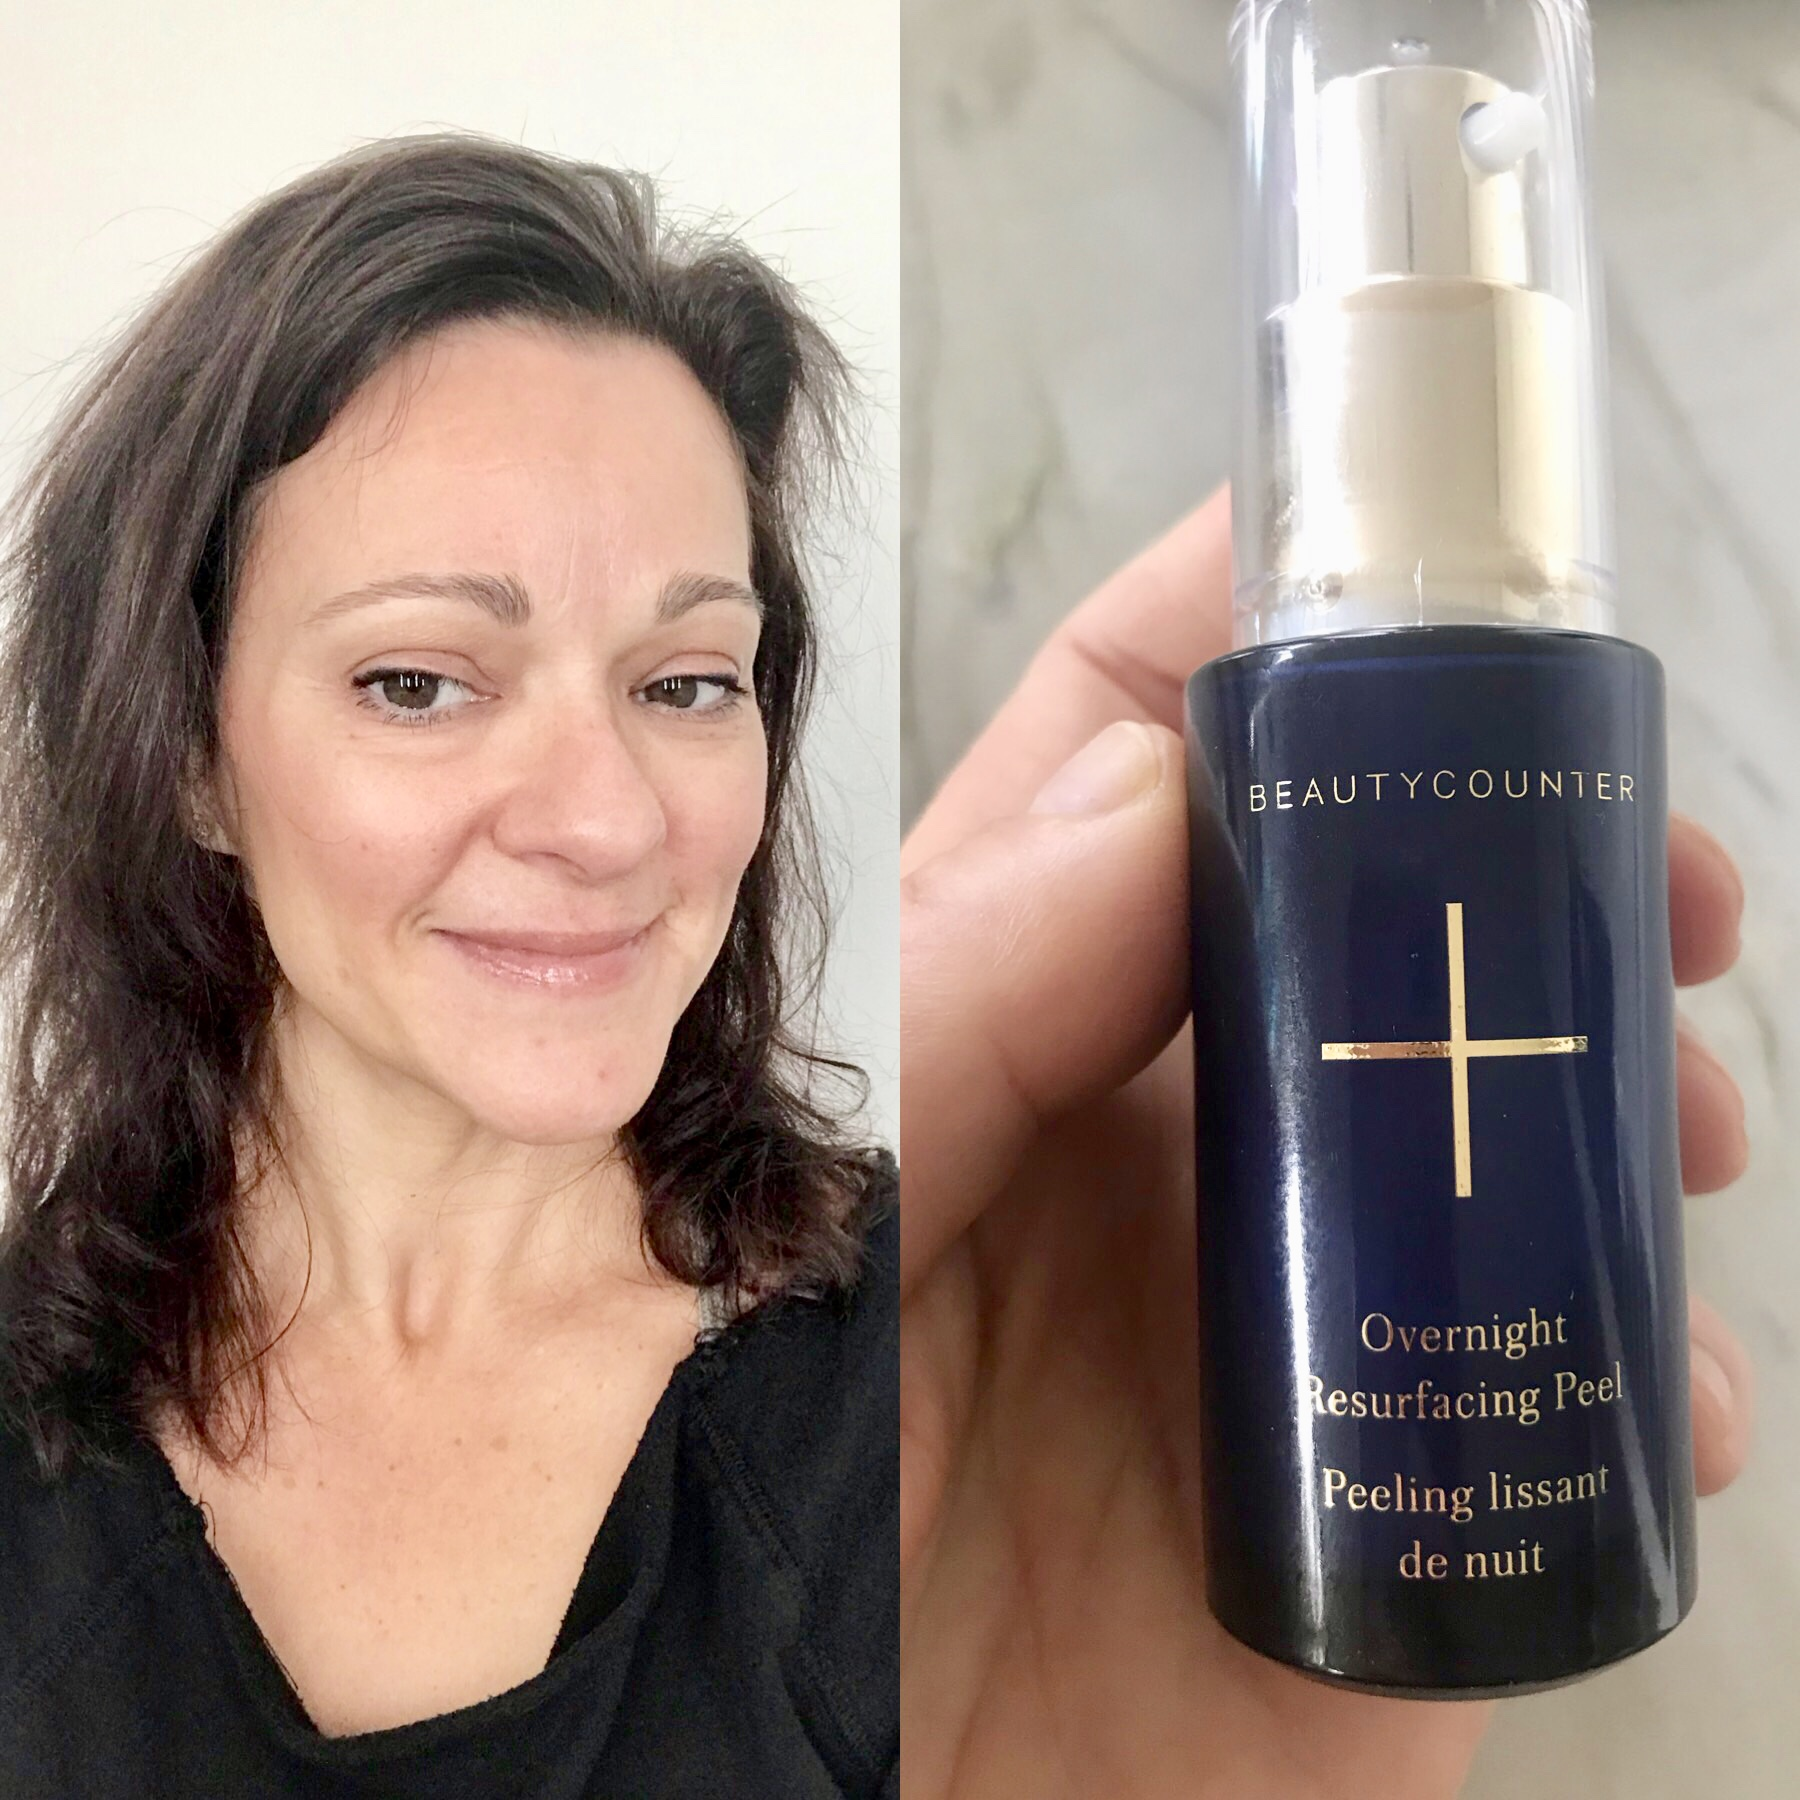 Overnight Resurfacing Peel - Wake up to glowing skin!